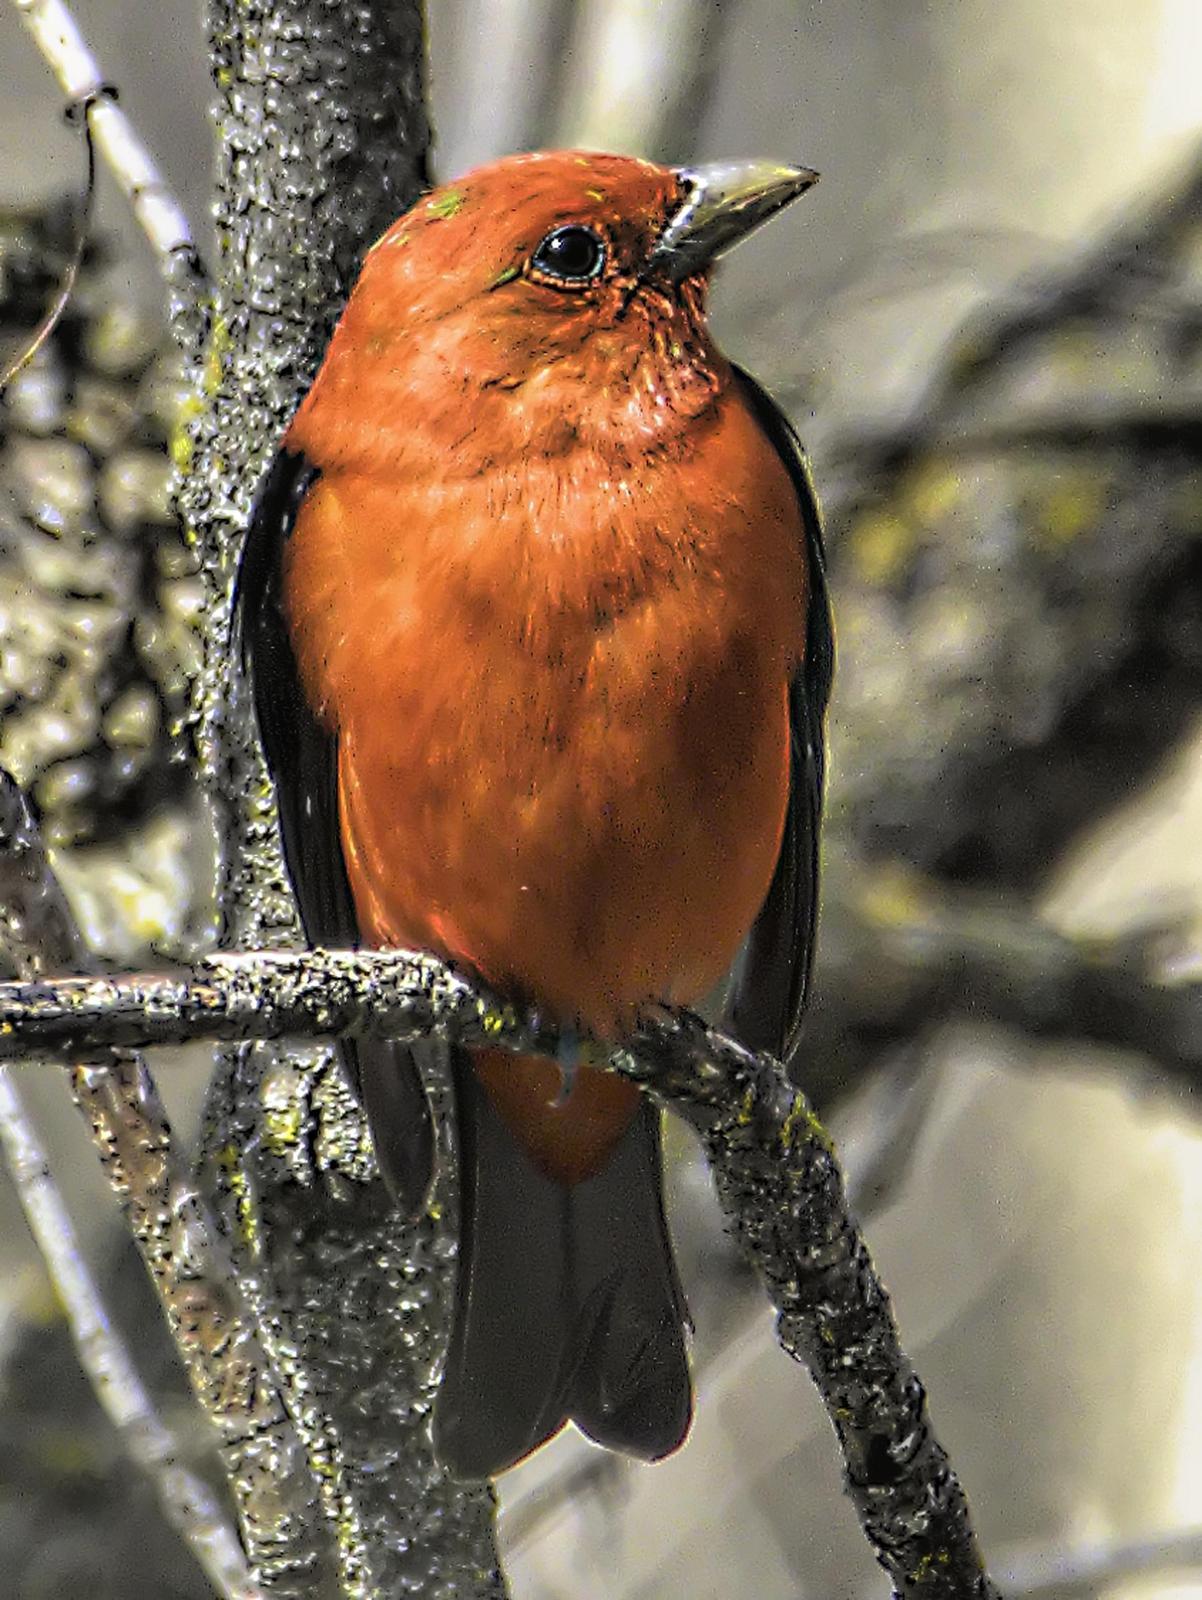 Scarlet Tanager Photo by Dan Tallman